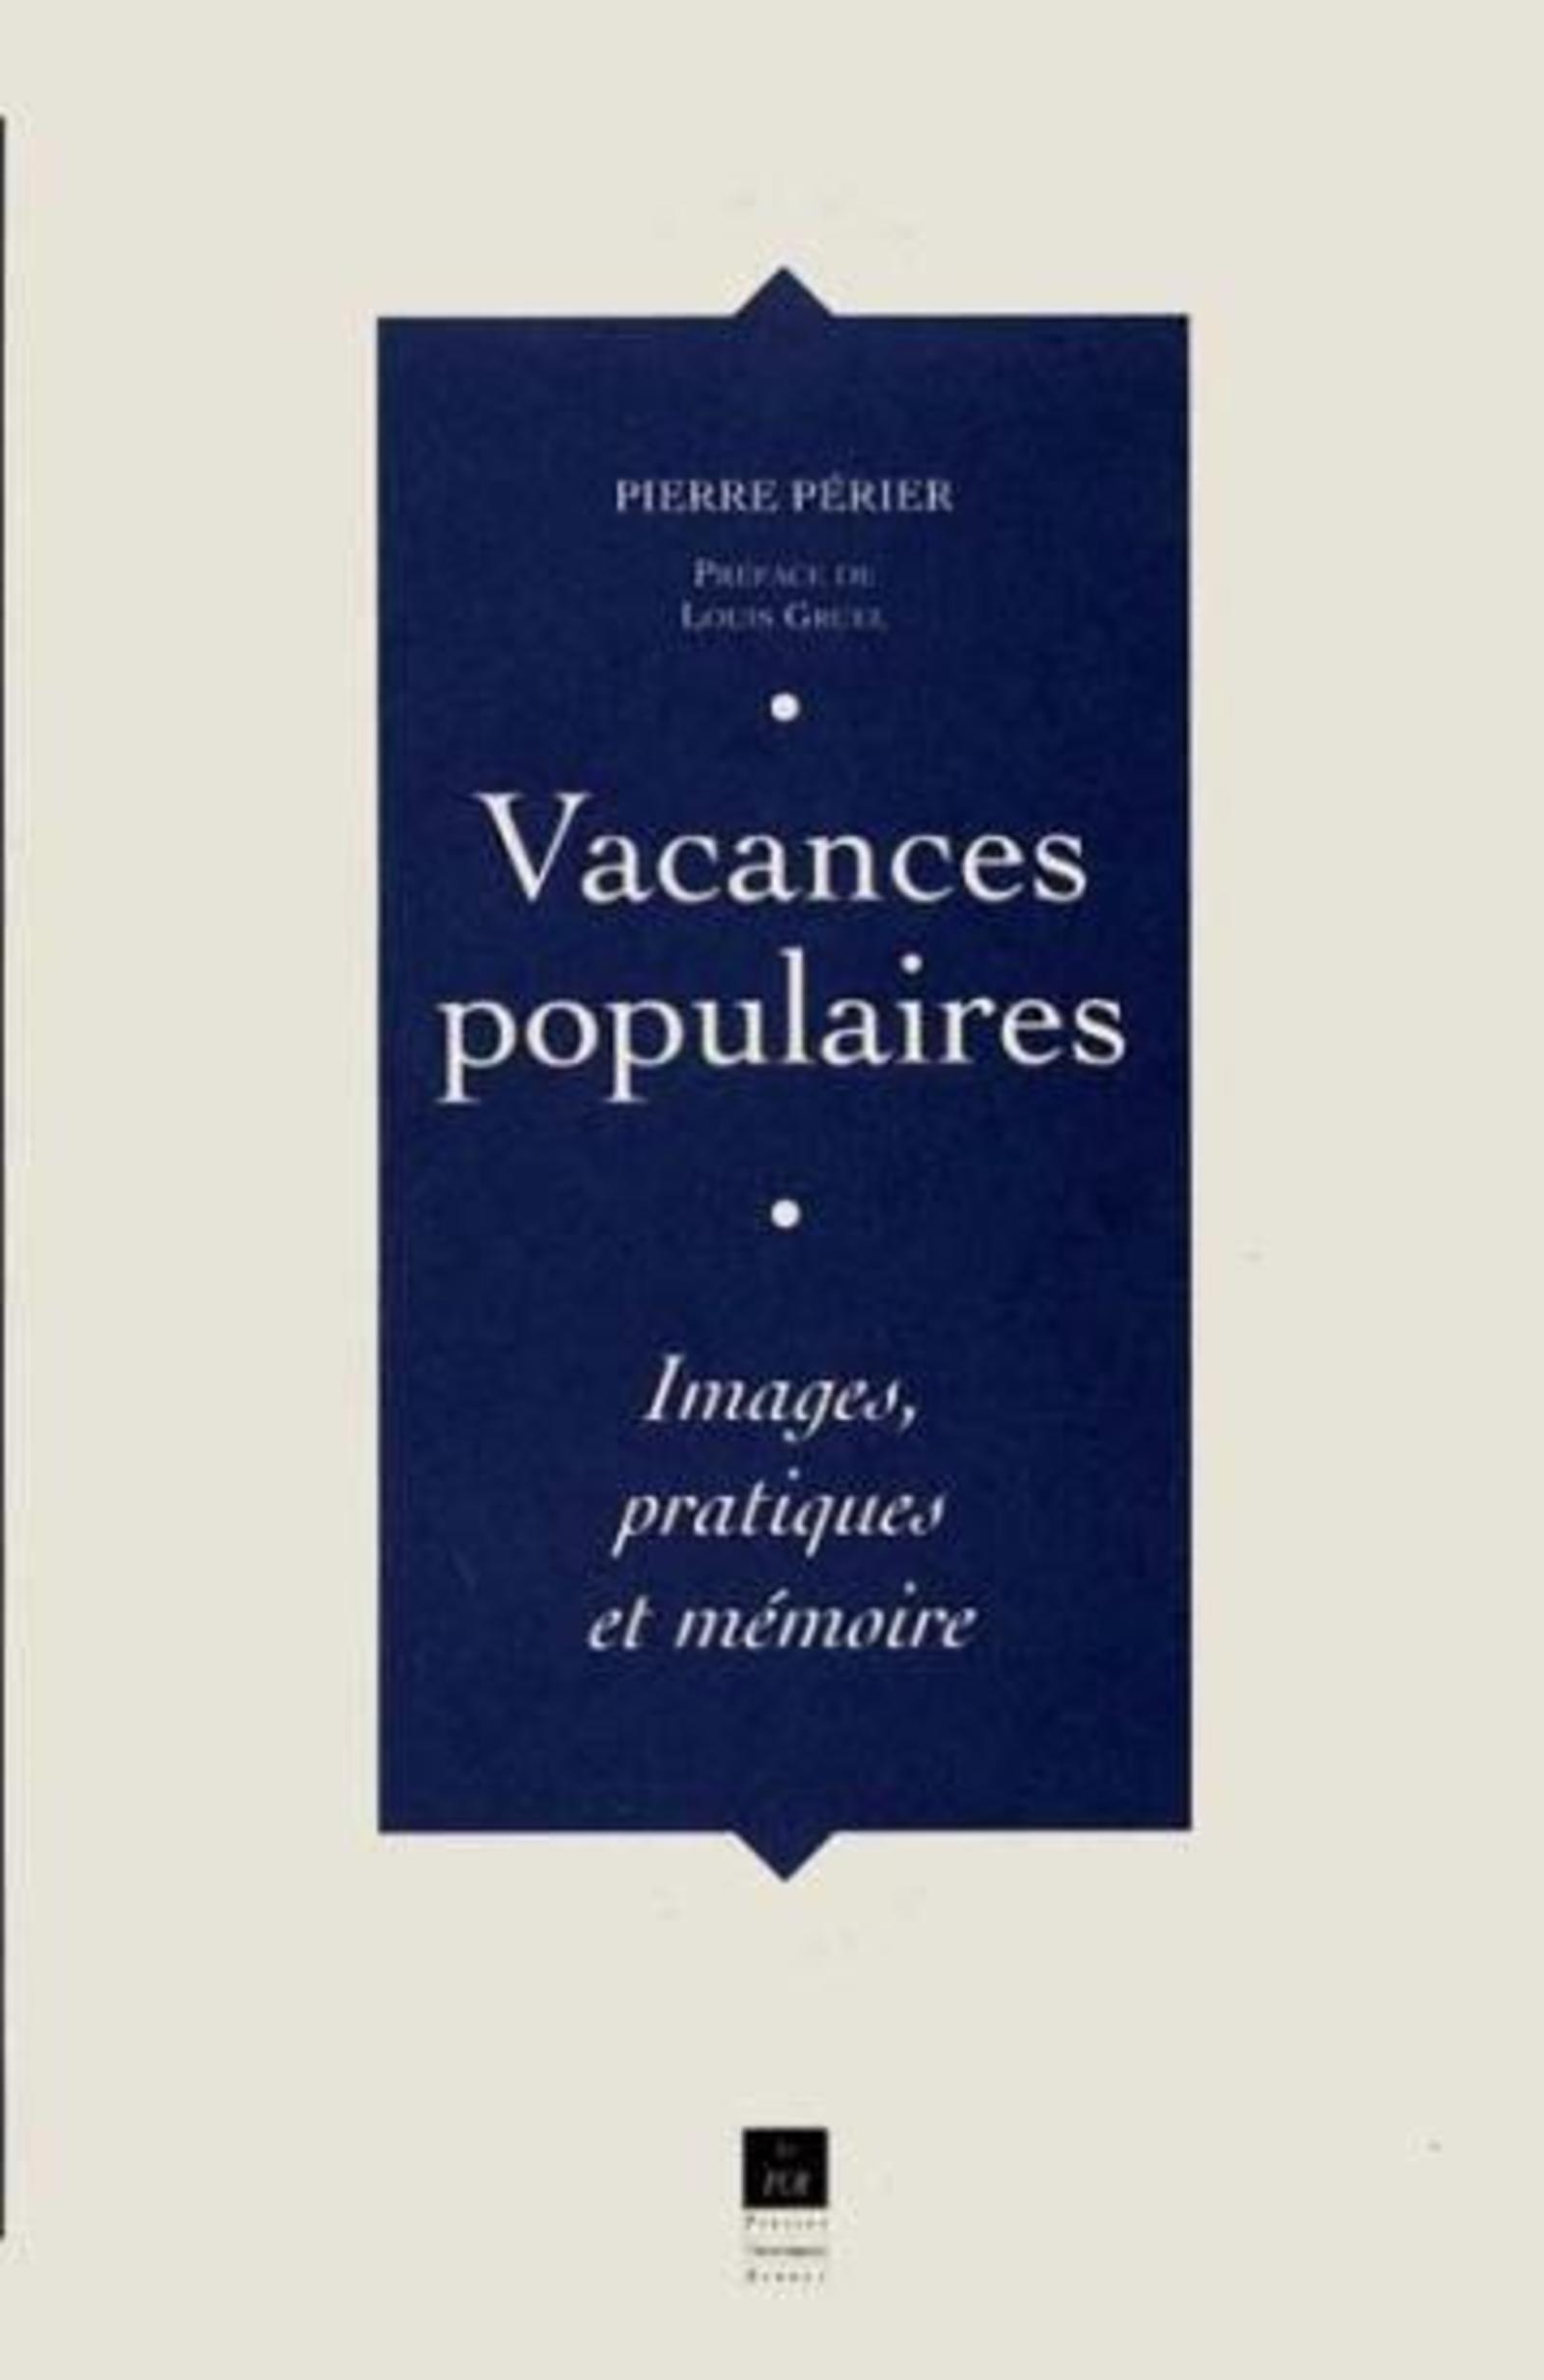 VACANCES POPULAIRES